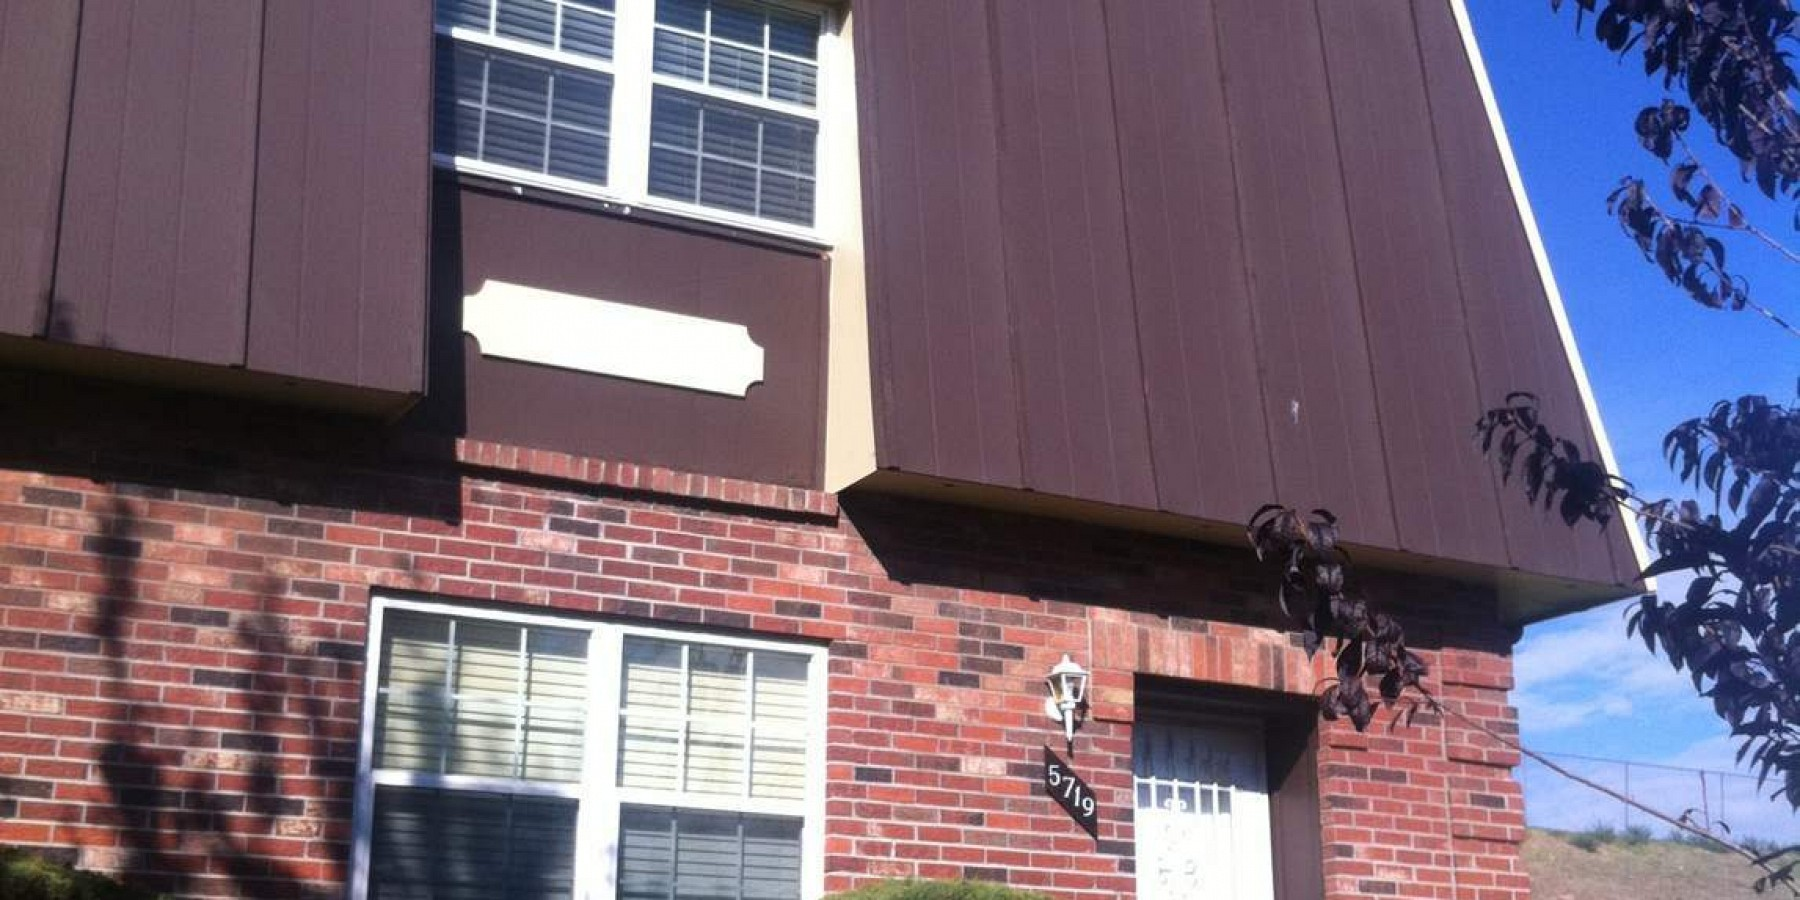 5719 South Lowell Blvd, Littleton, CO 80123